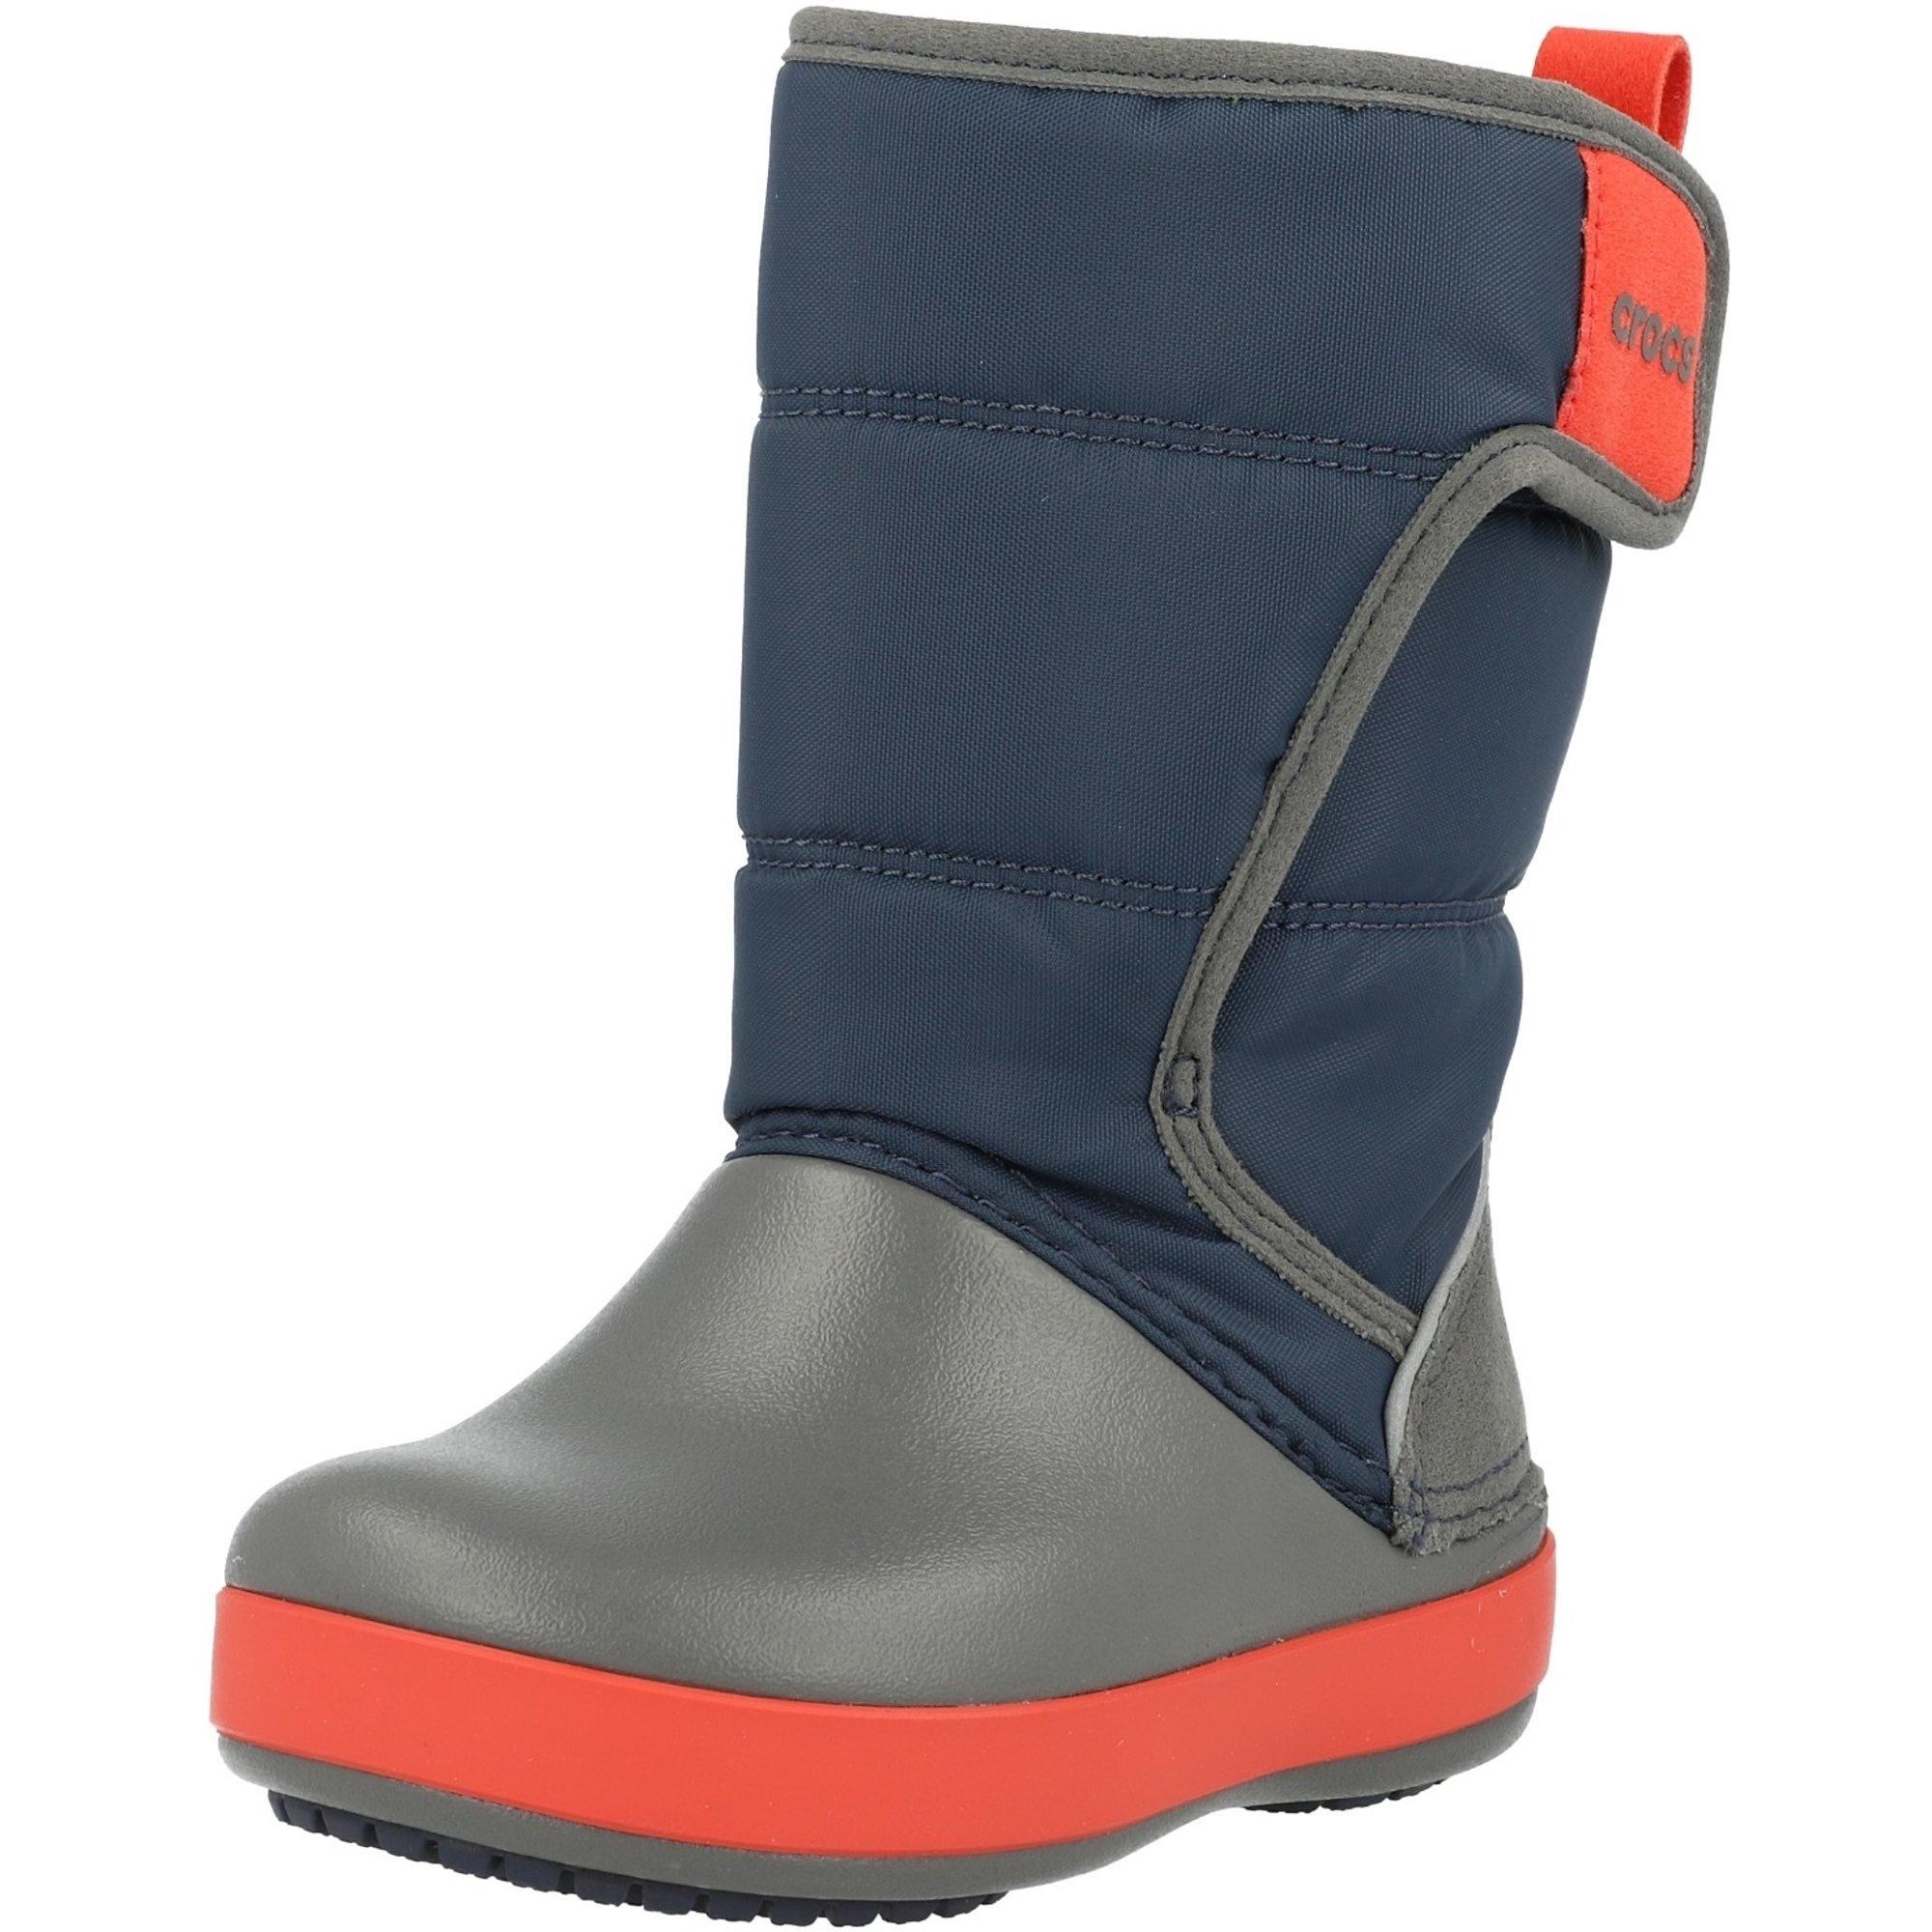 Crocs Kids LodgePoint Snow Boot Navy/Slate Grey Croslite